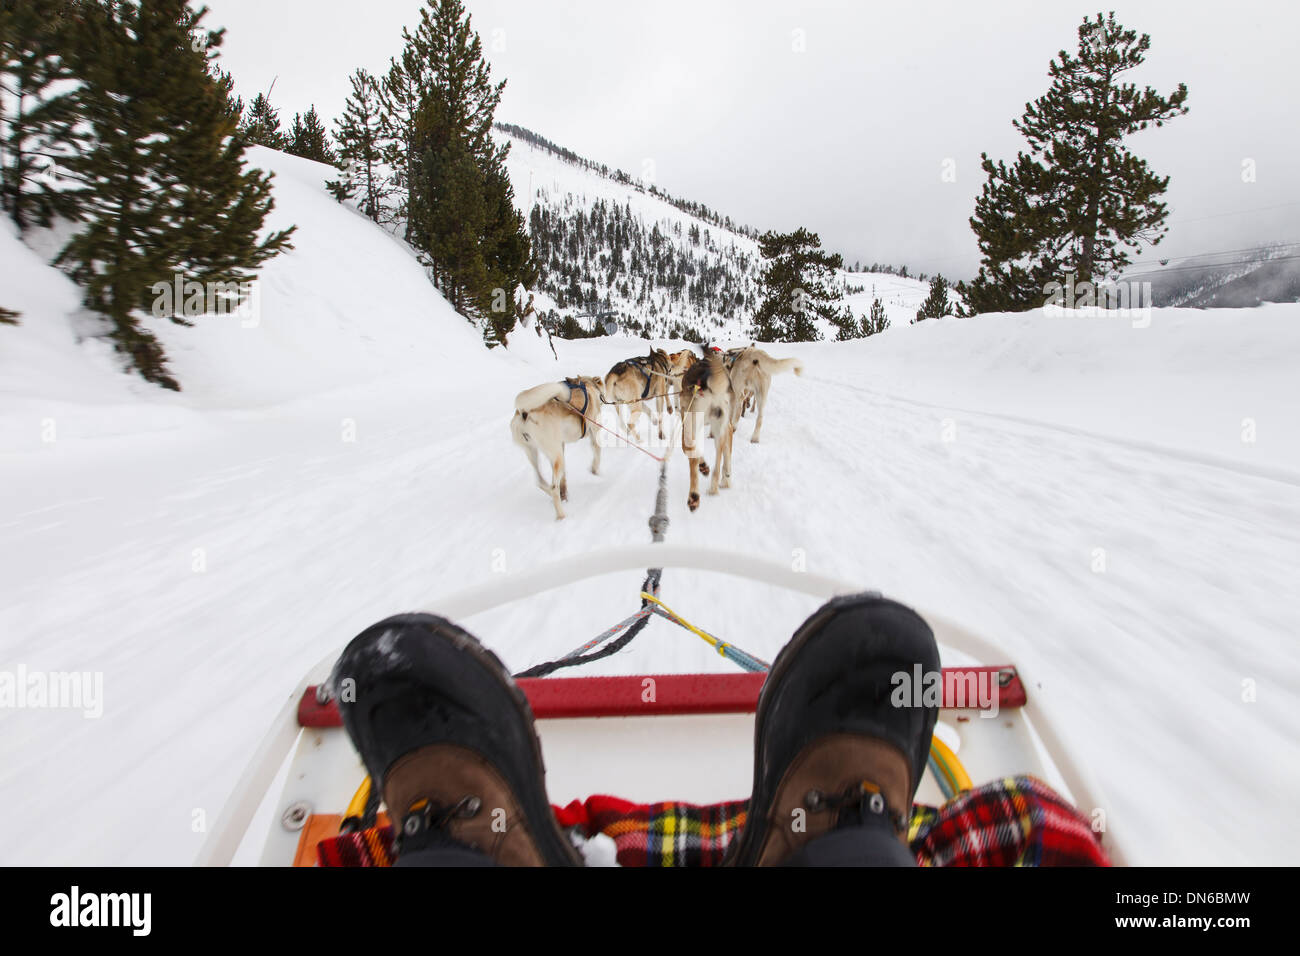 Musing in winter. Vallnord ski resort. Andorra - Stock Image